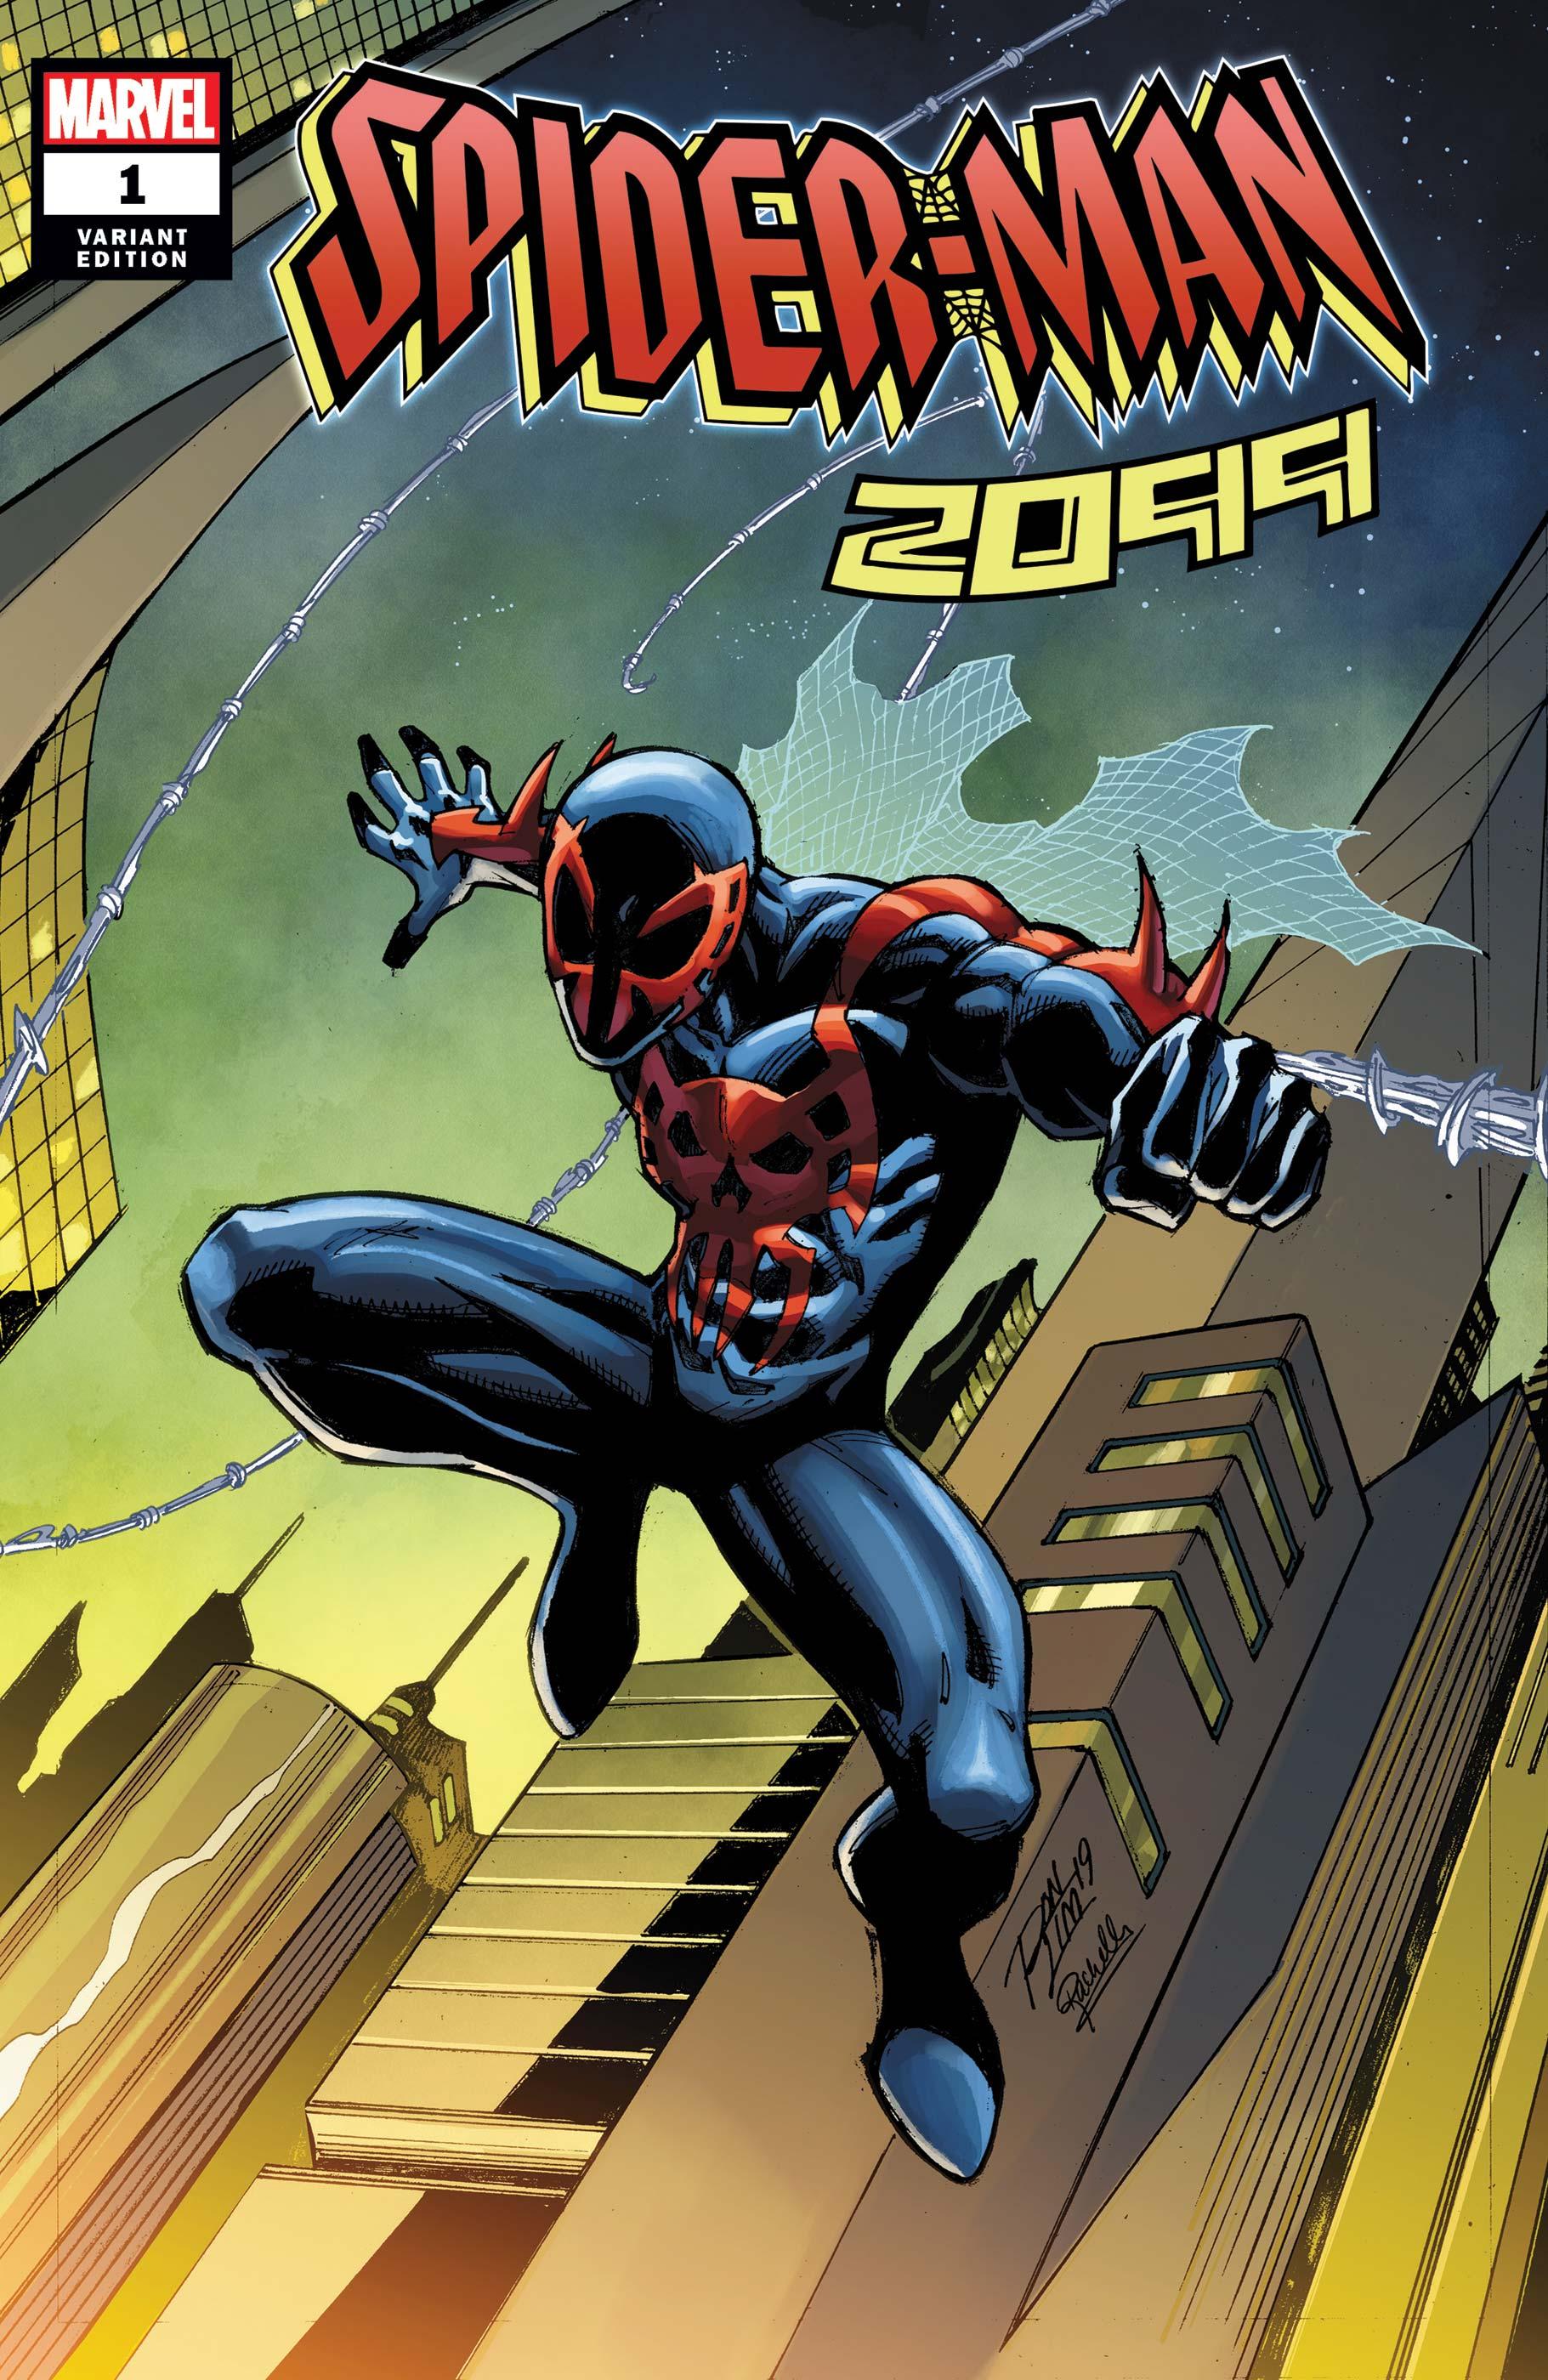 Spider-Man 2099 (2019) #1 (Variant)